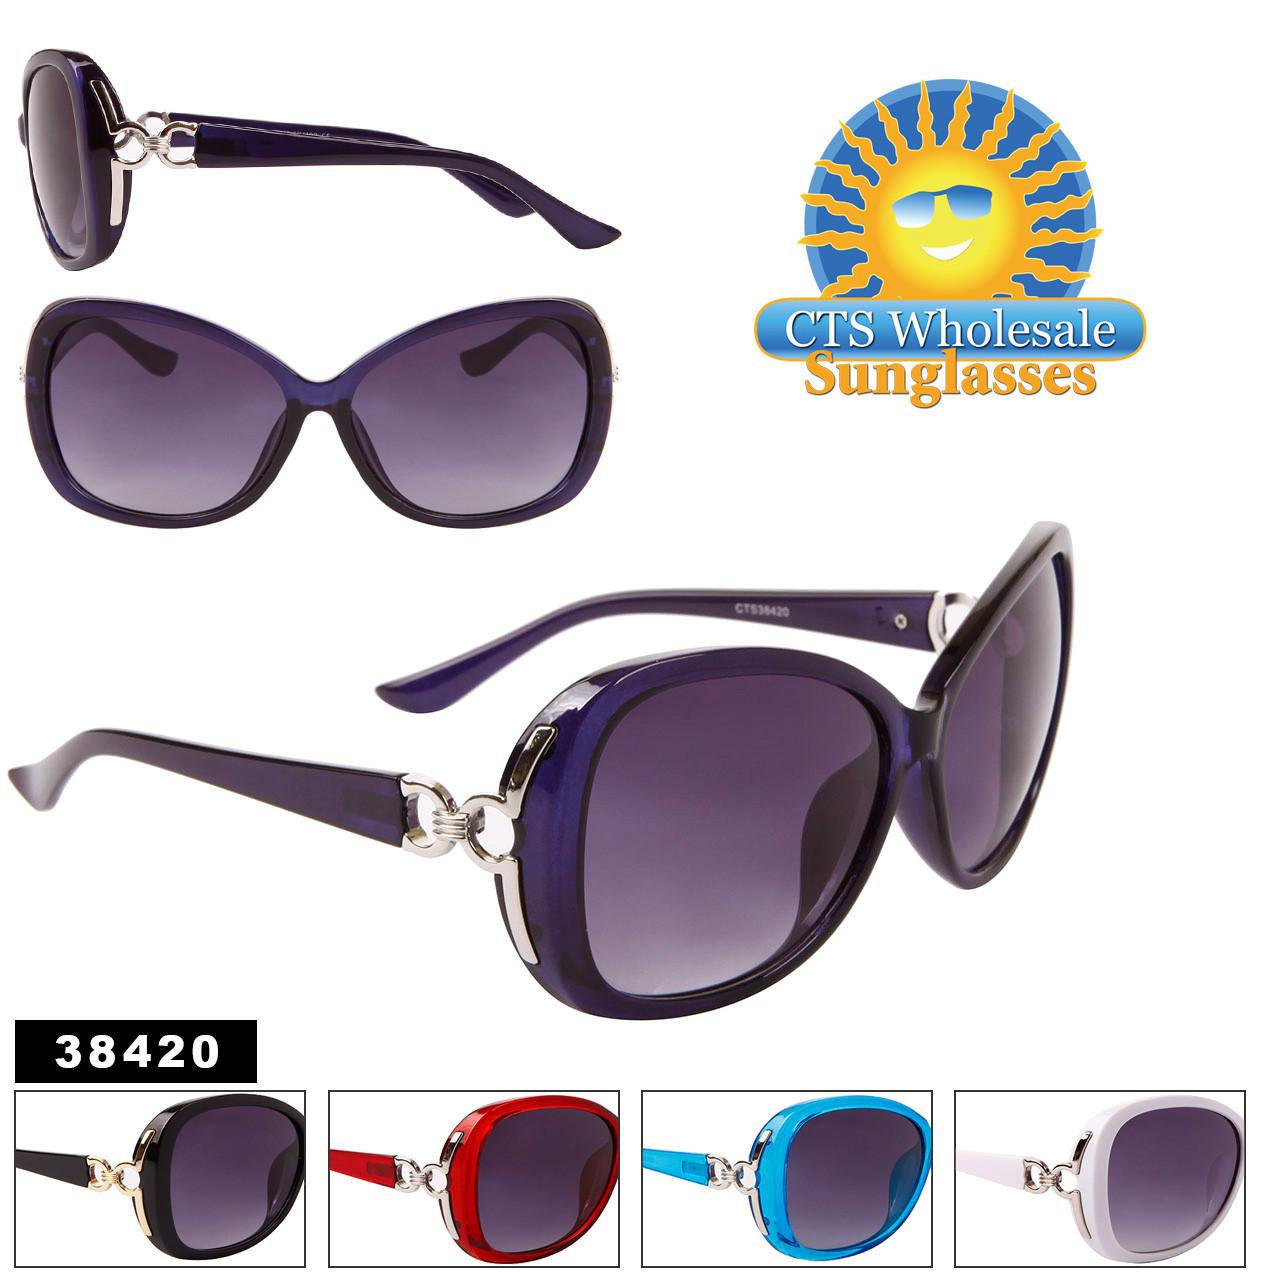 Women's Fashion Sunglasses Wholesale - Style #38420